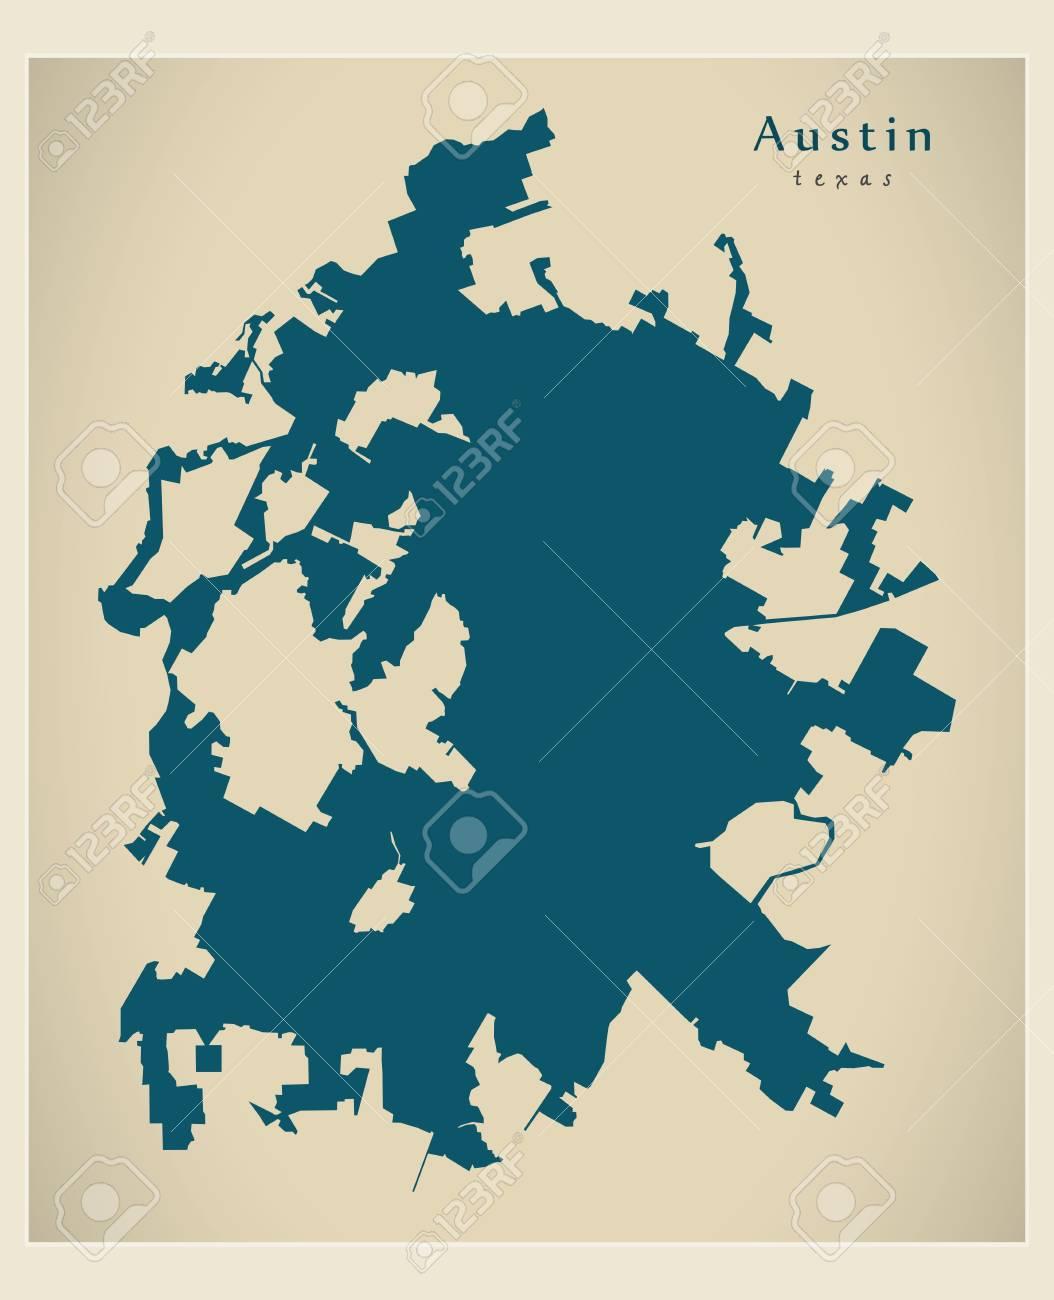 Map Of Texas City.Modern City Map Austin Texas City Of The Usa